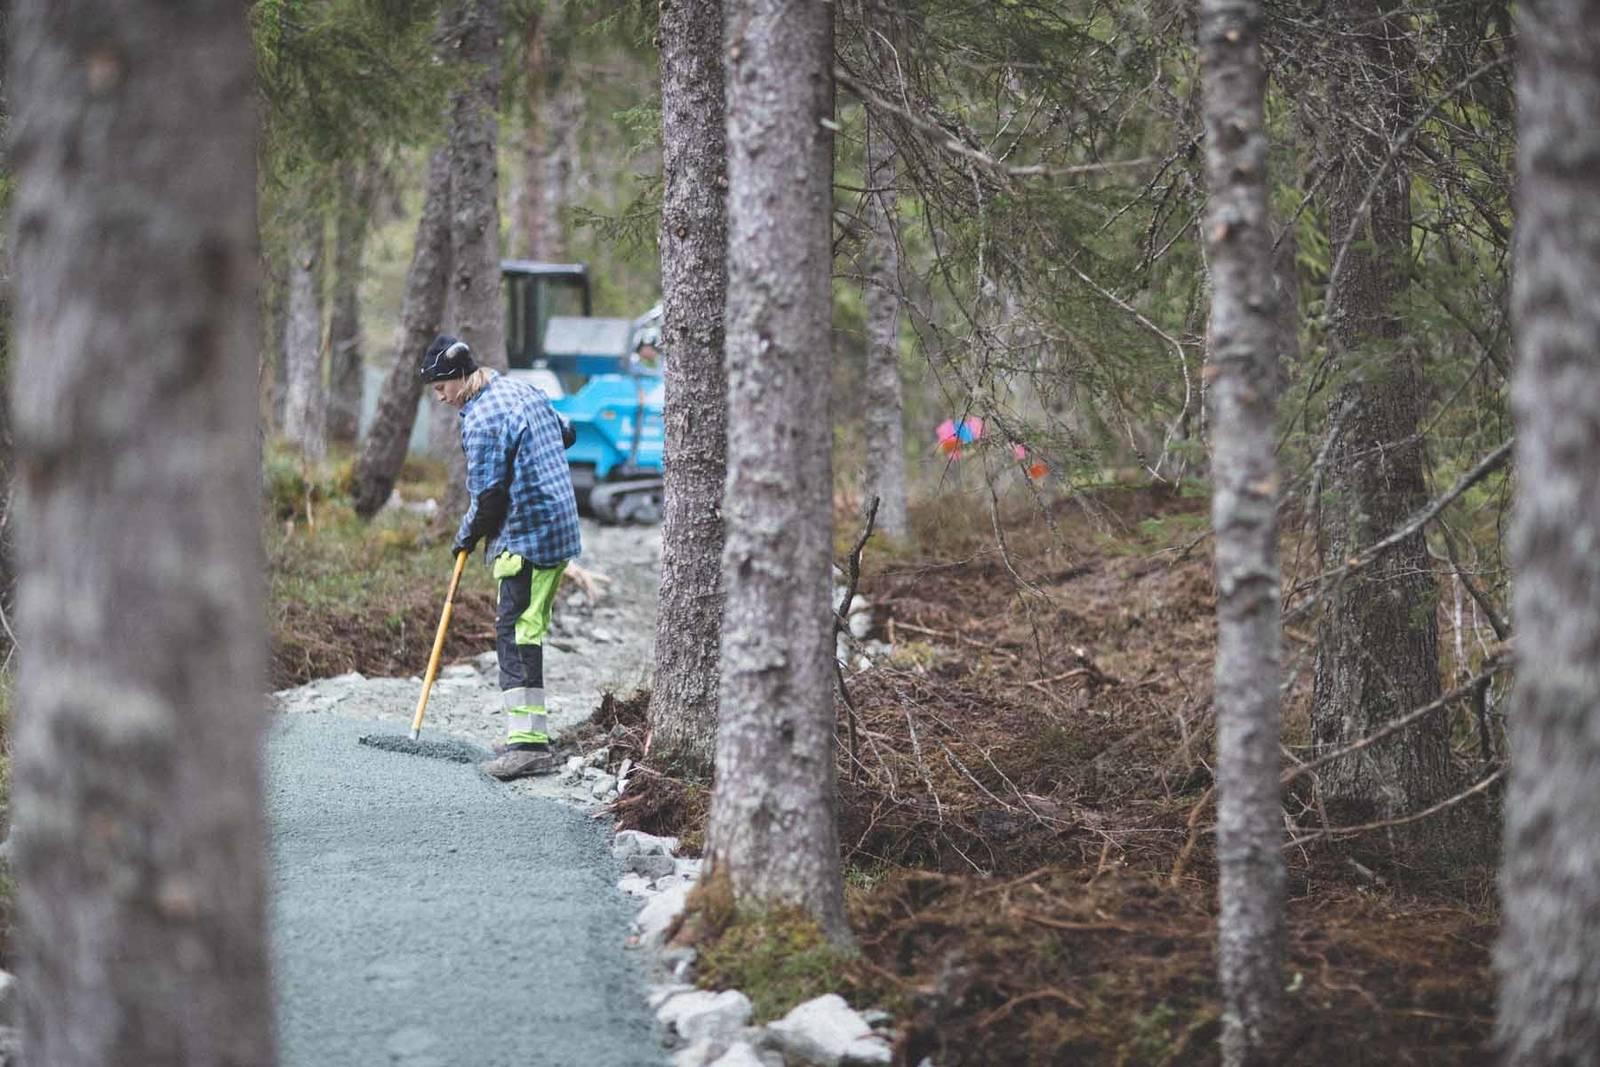 nilsbyen sykkelpark